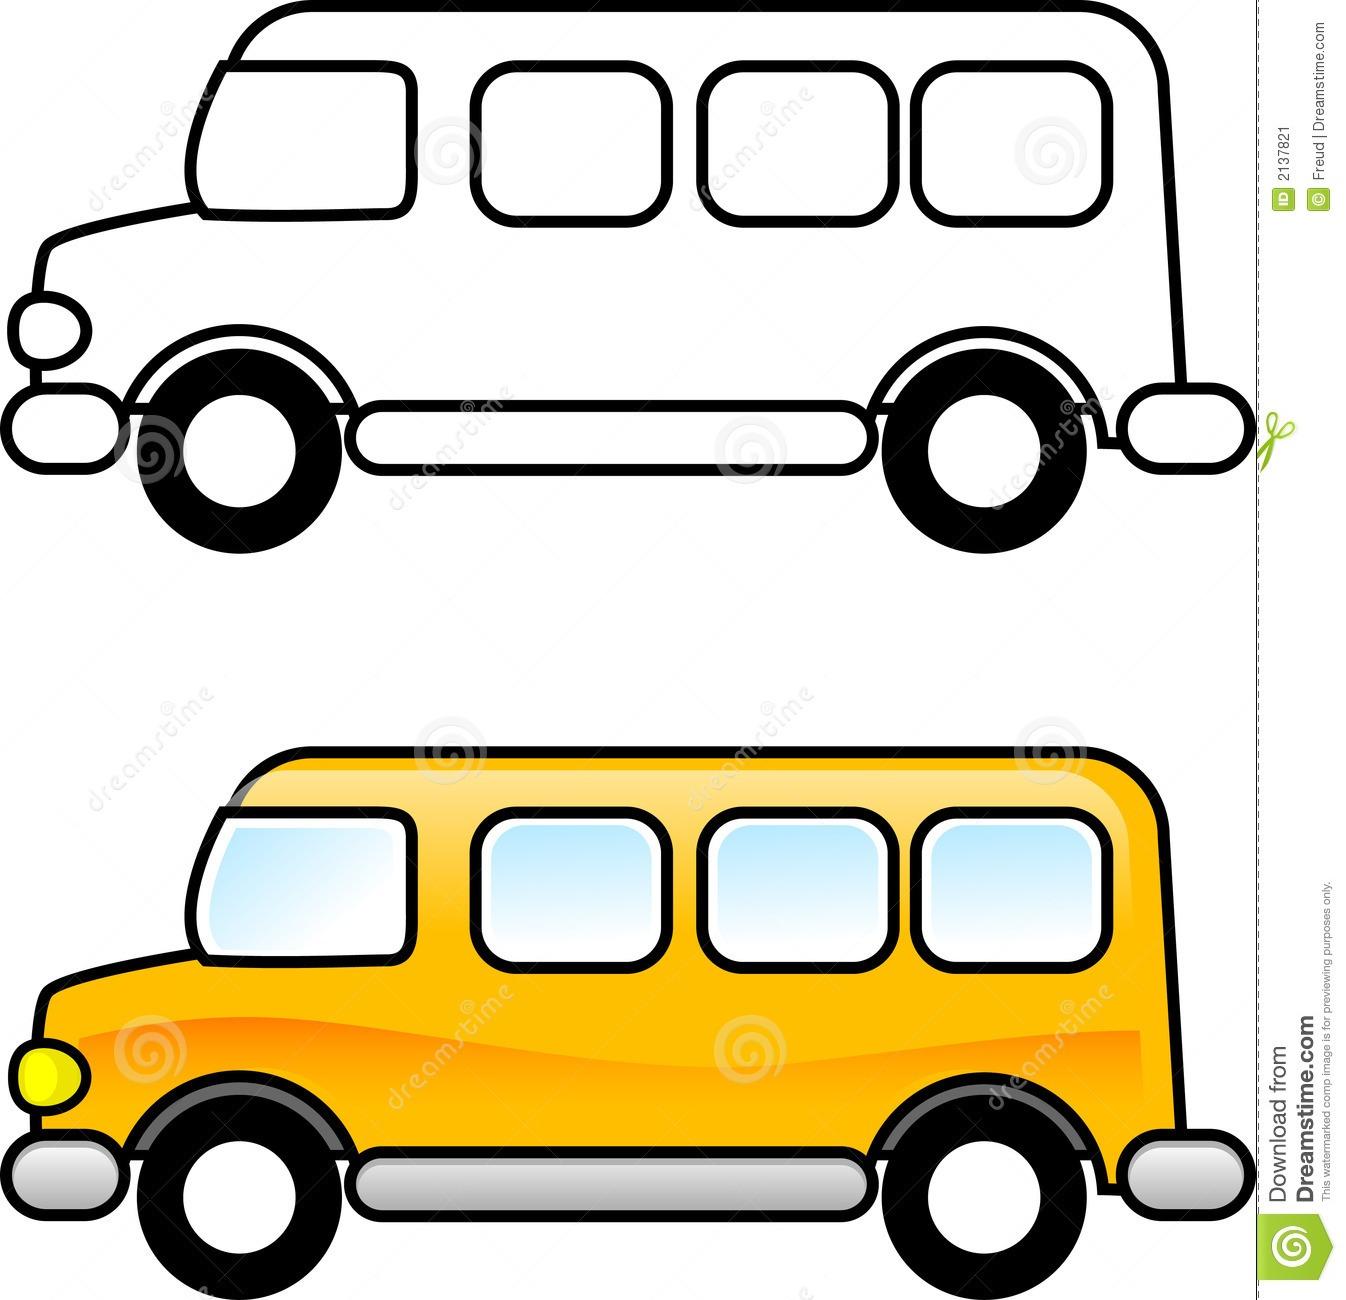 Free Clip Art School Bus